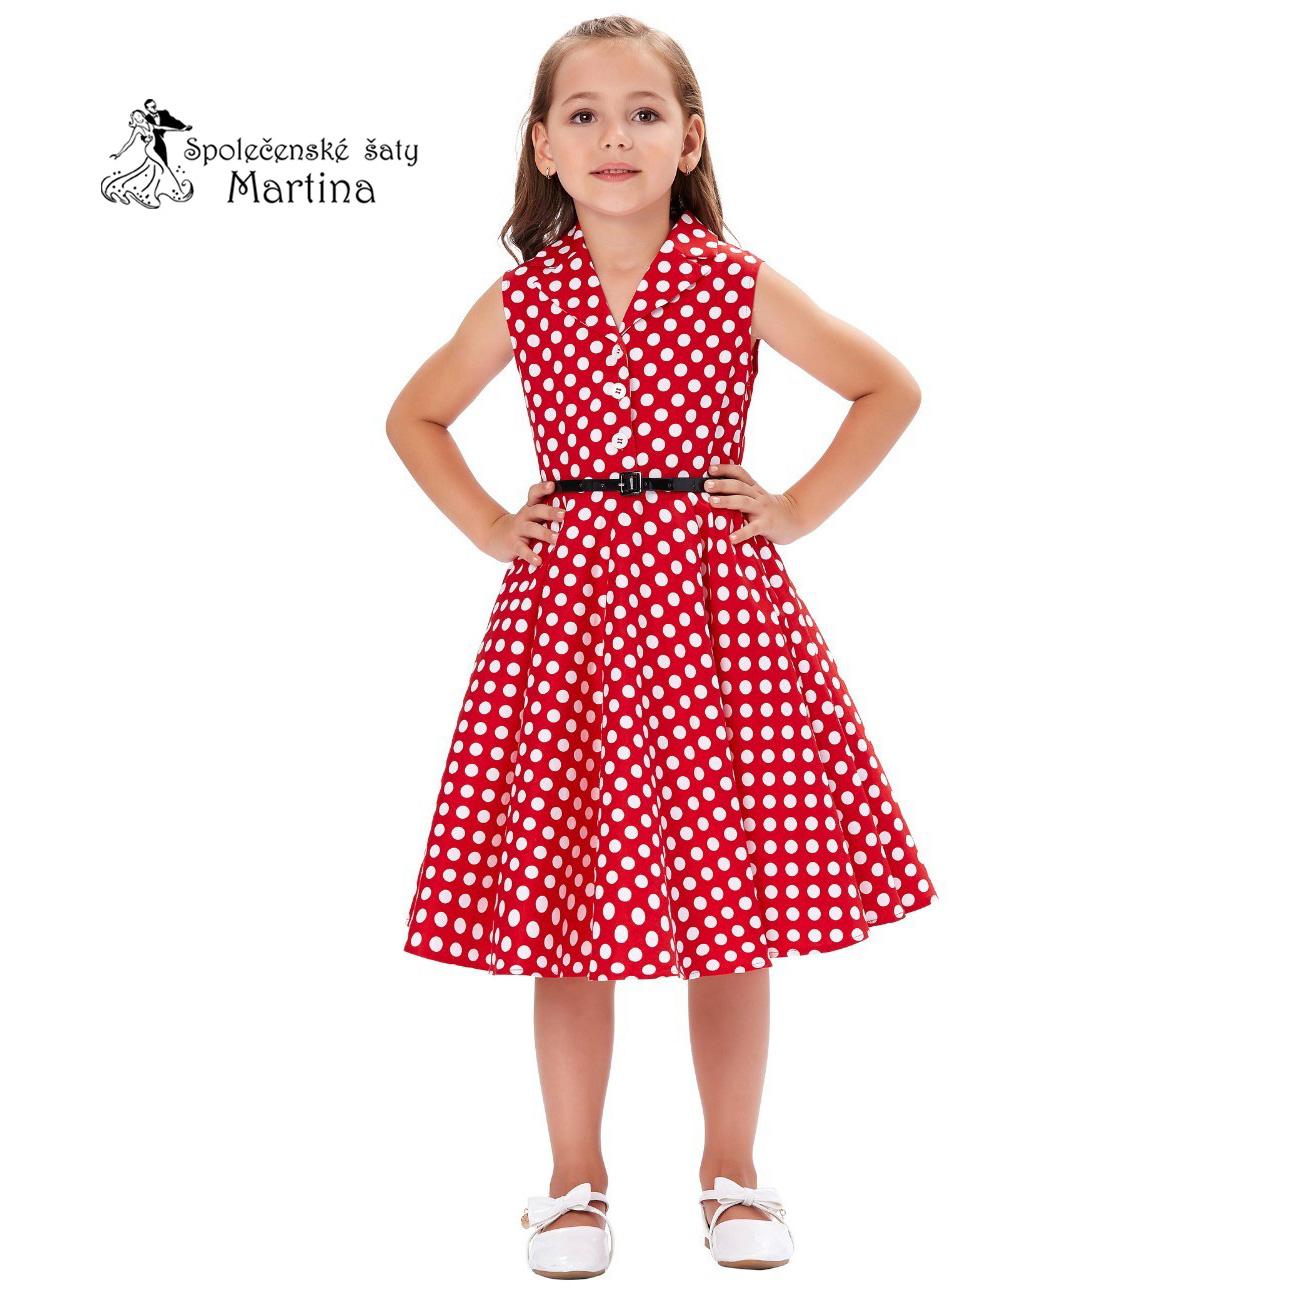 0d7037fea9f8 Retro vintage dívčí šaty